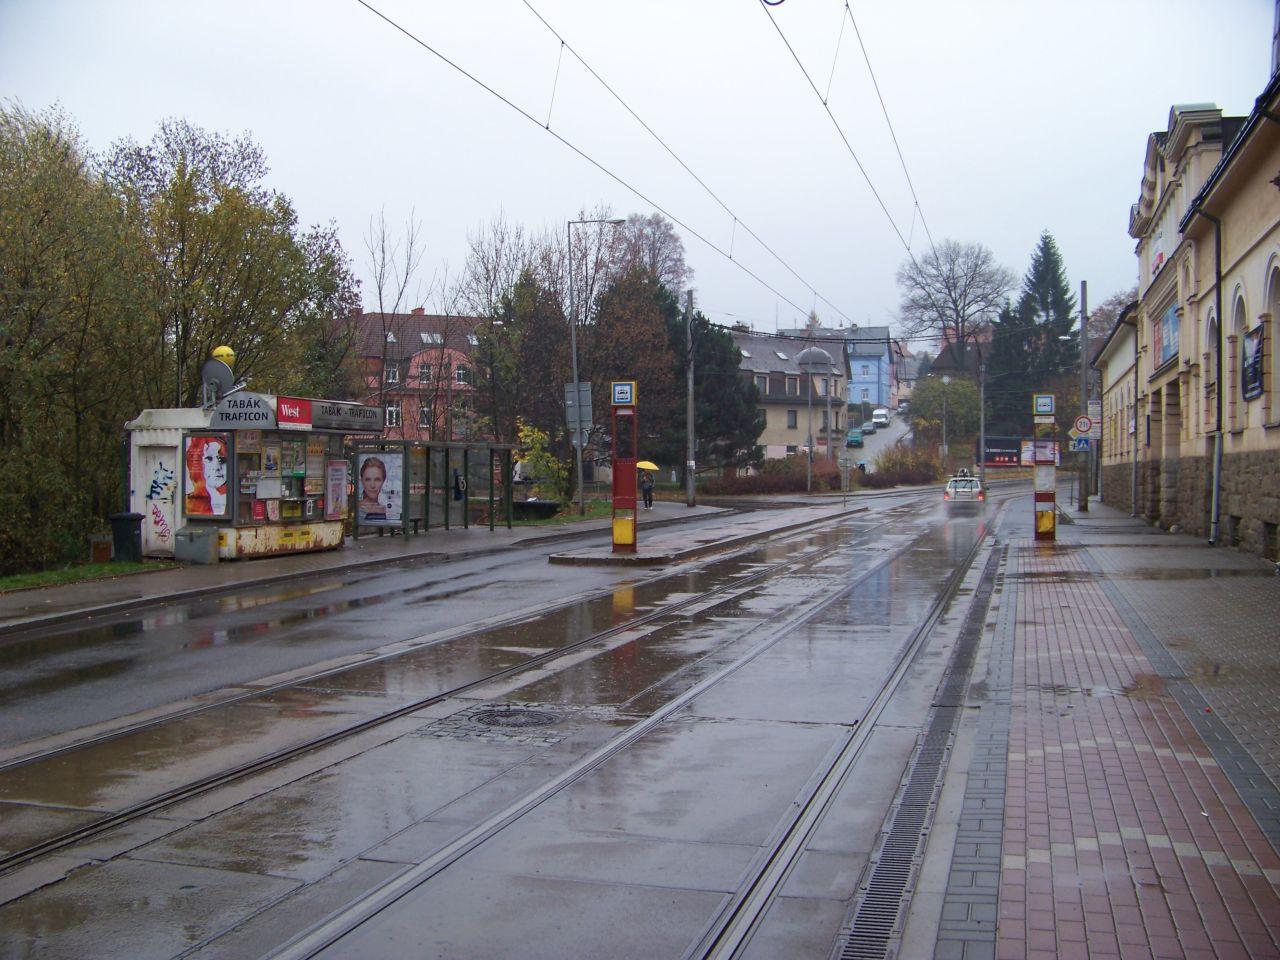 Hanychovská ulice v Liberci a zastávka Staré pekárny. Foto: ŠJů / Wikimedia Commons